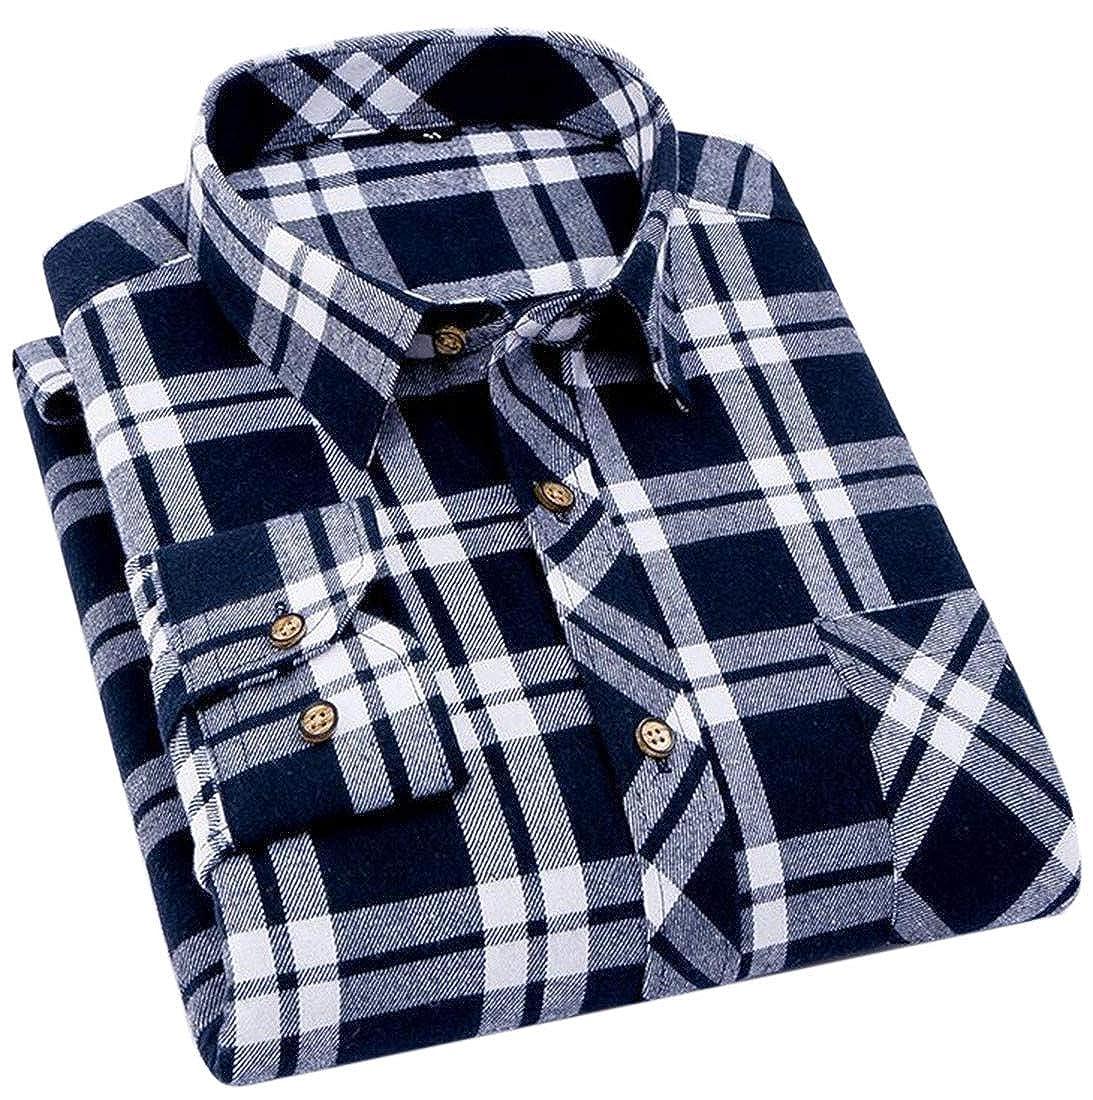 Nanquan Men Casual One Pocket Plaid Print Button Up Slim Fit Long Sleeve Shirt